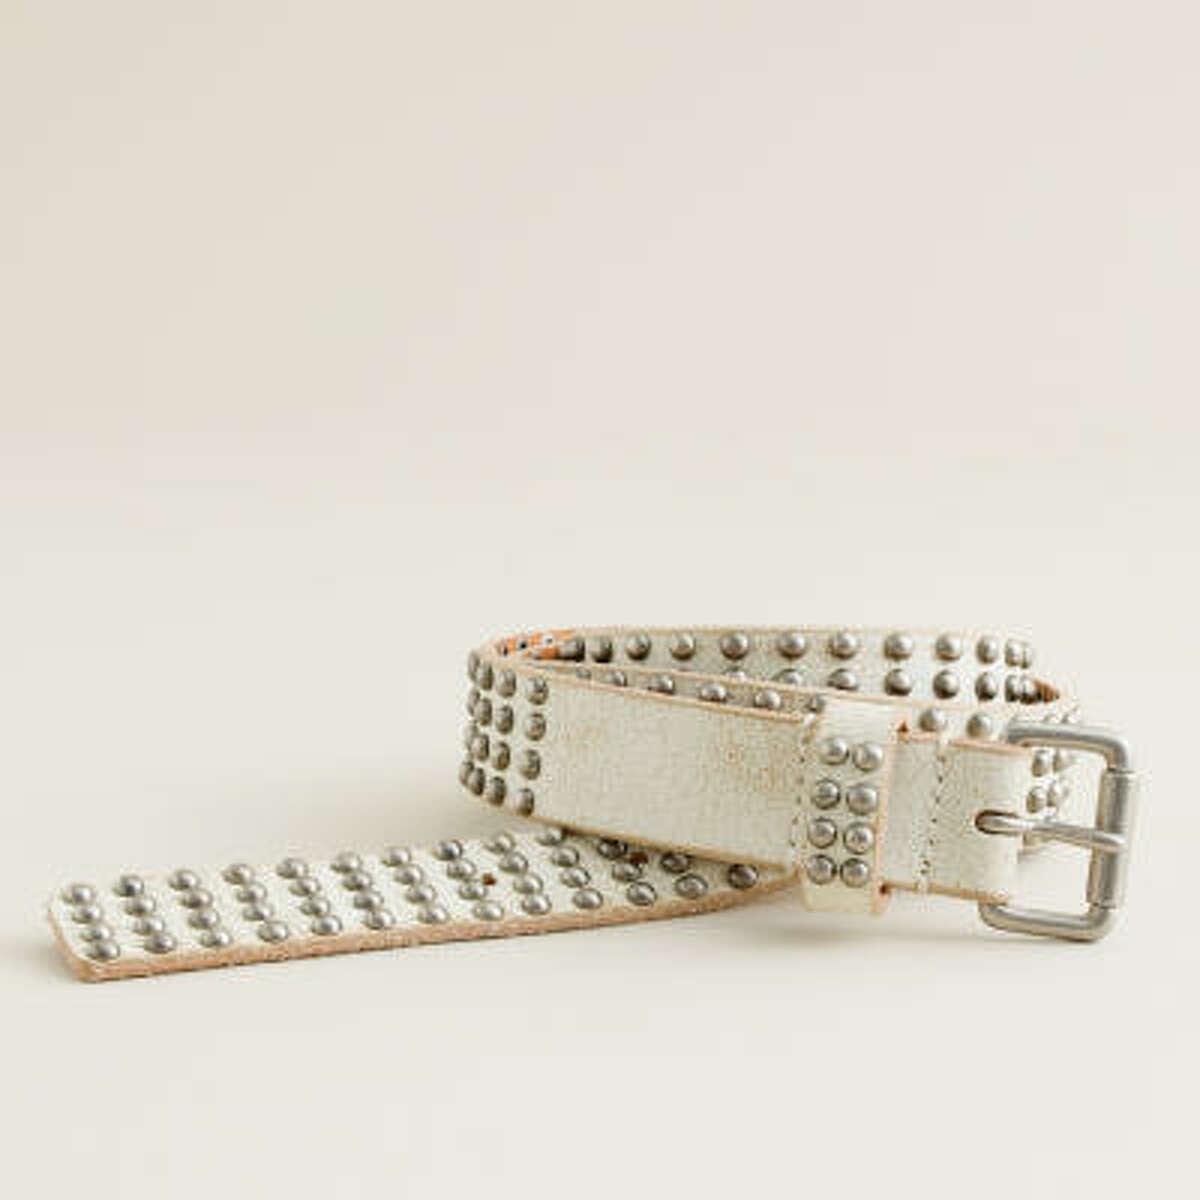 Studded belt, $68, from J. Crew stores or www.jcrew.com.